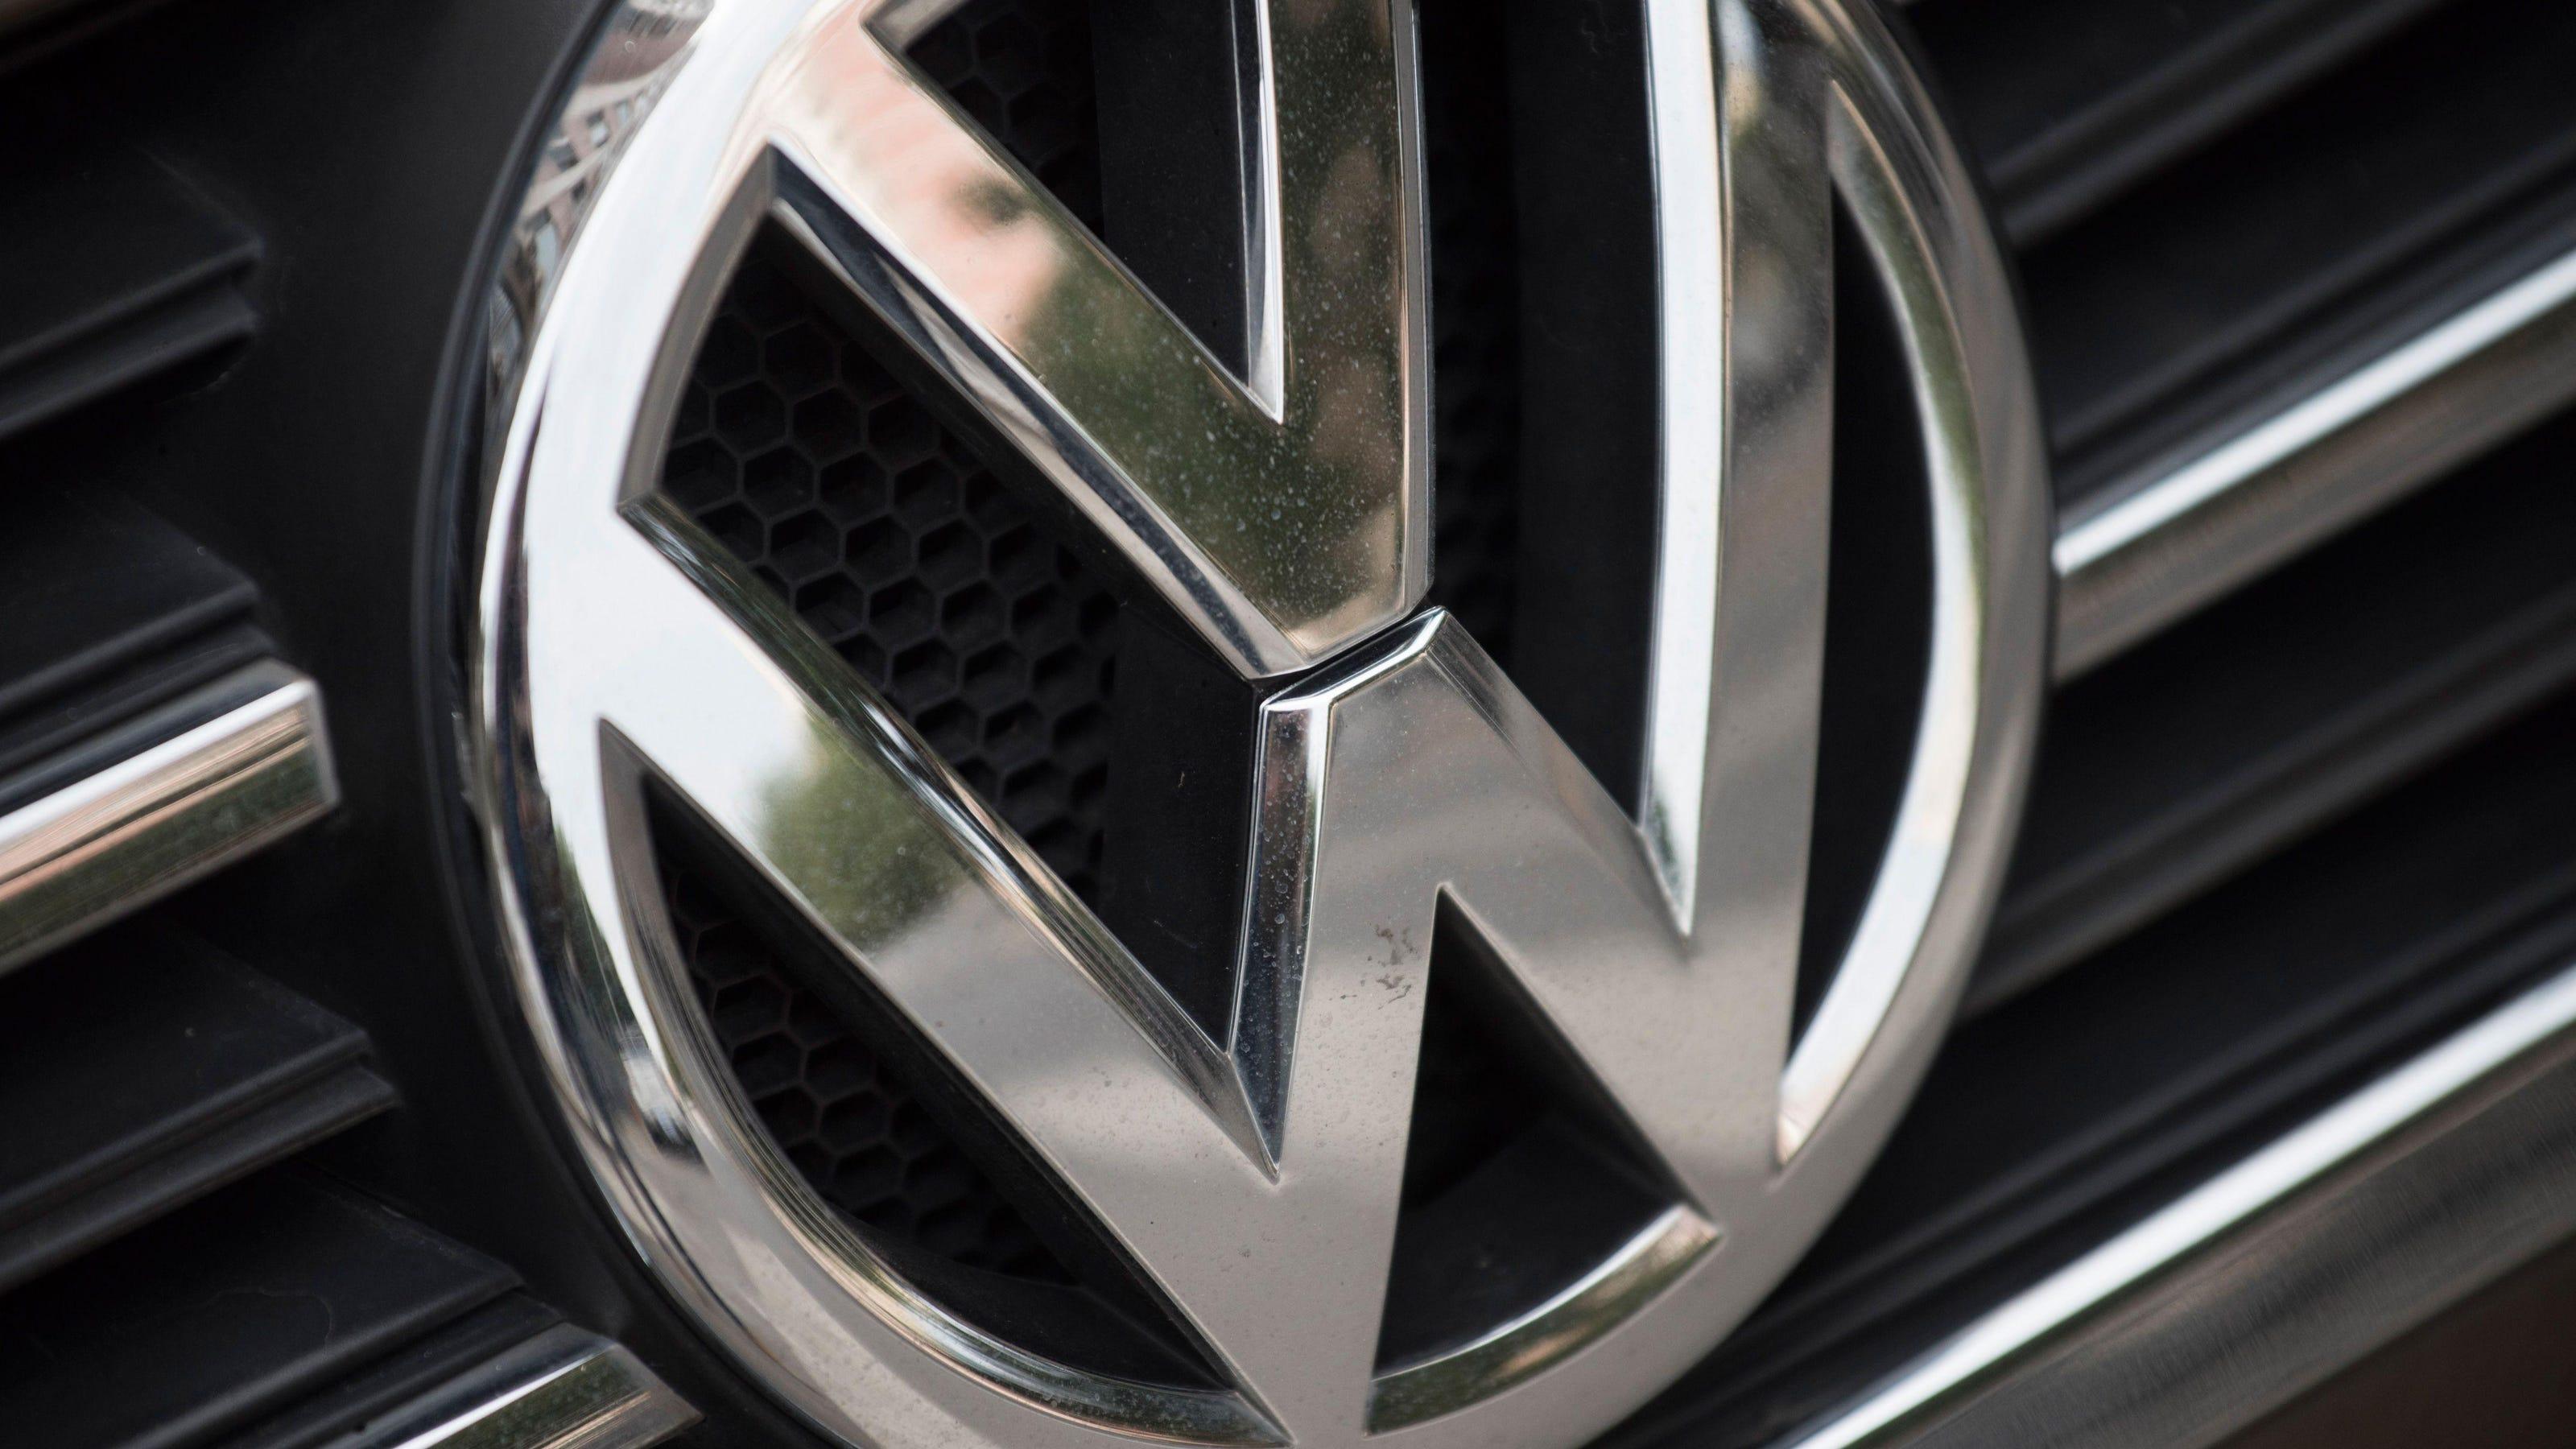 VW Dieselgate scandal ensnares German supplier, to pay $35M fine